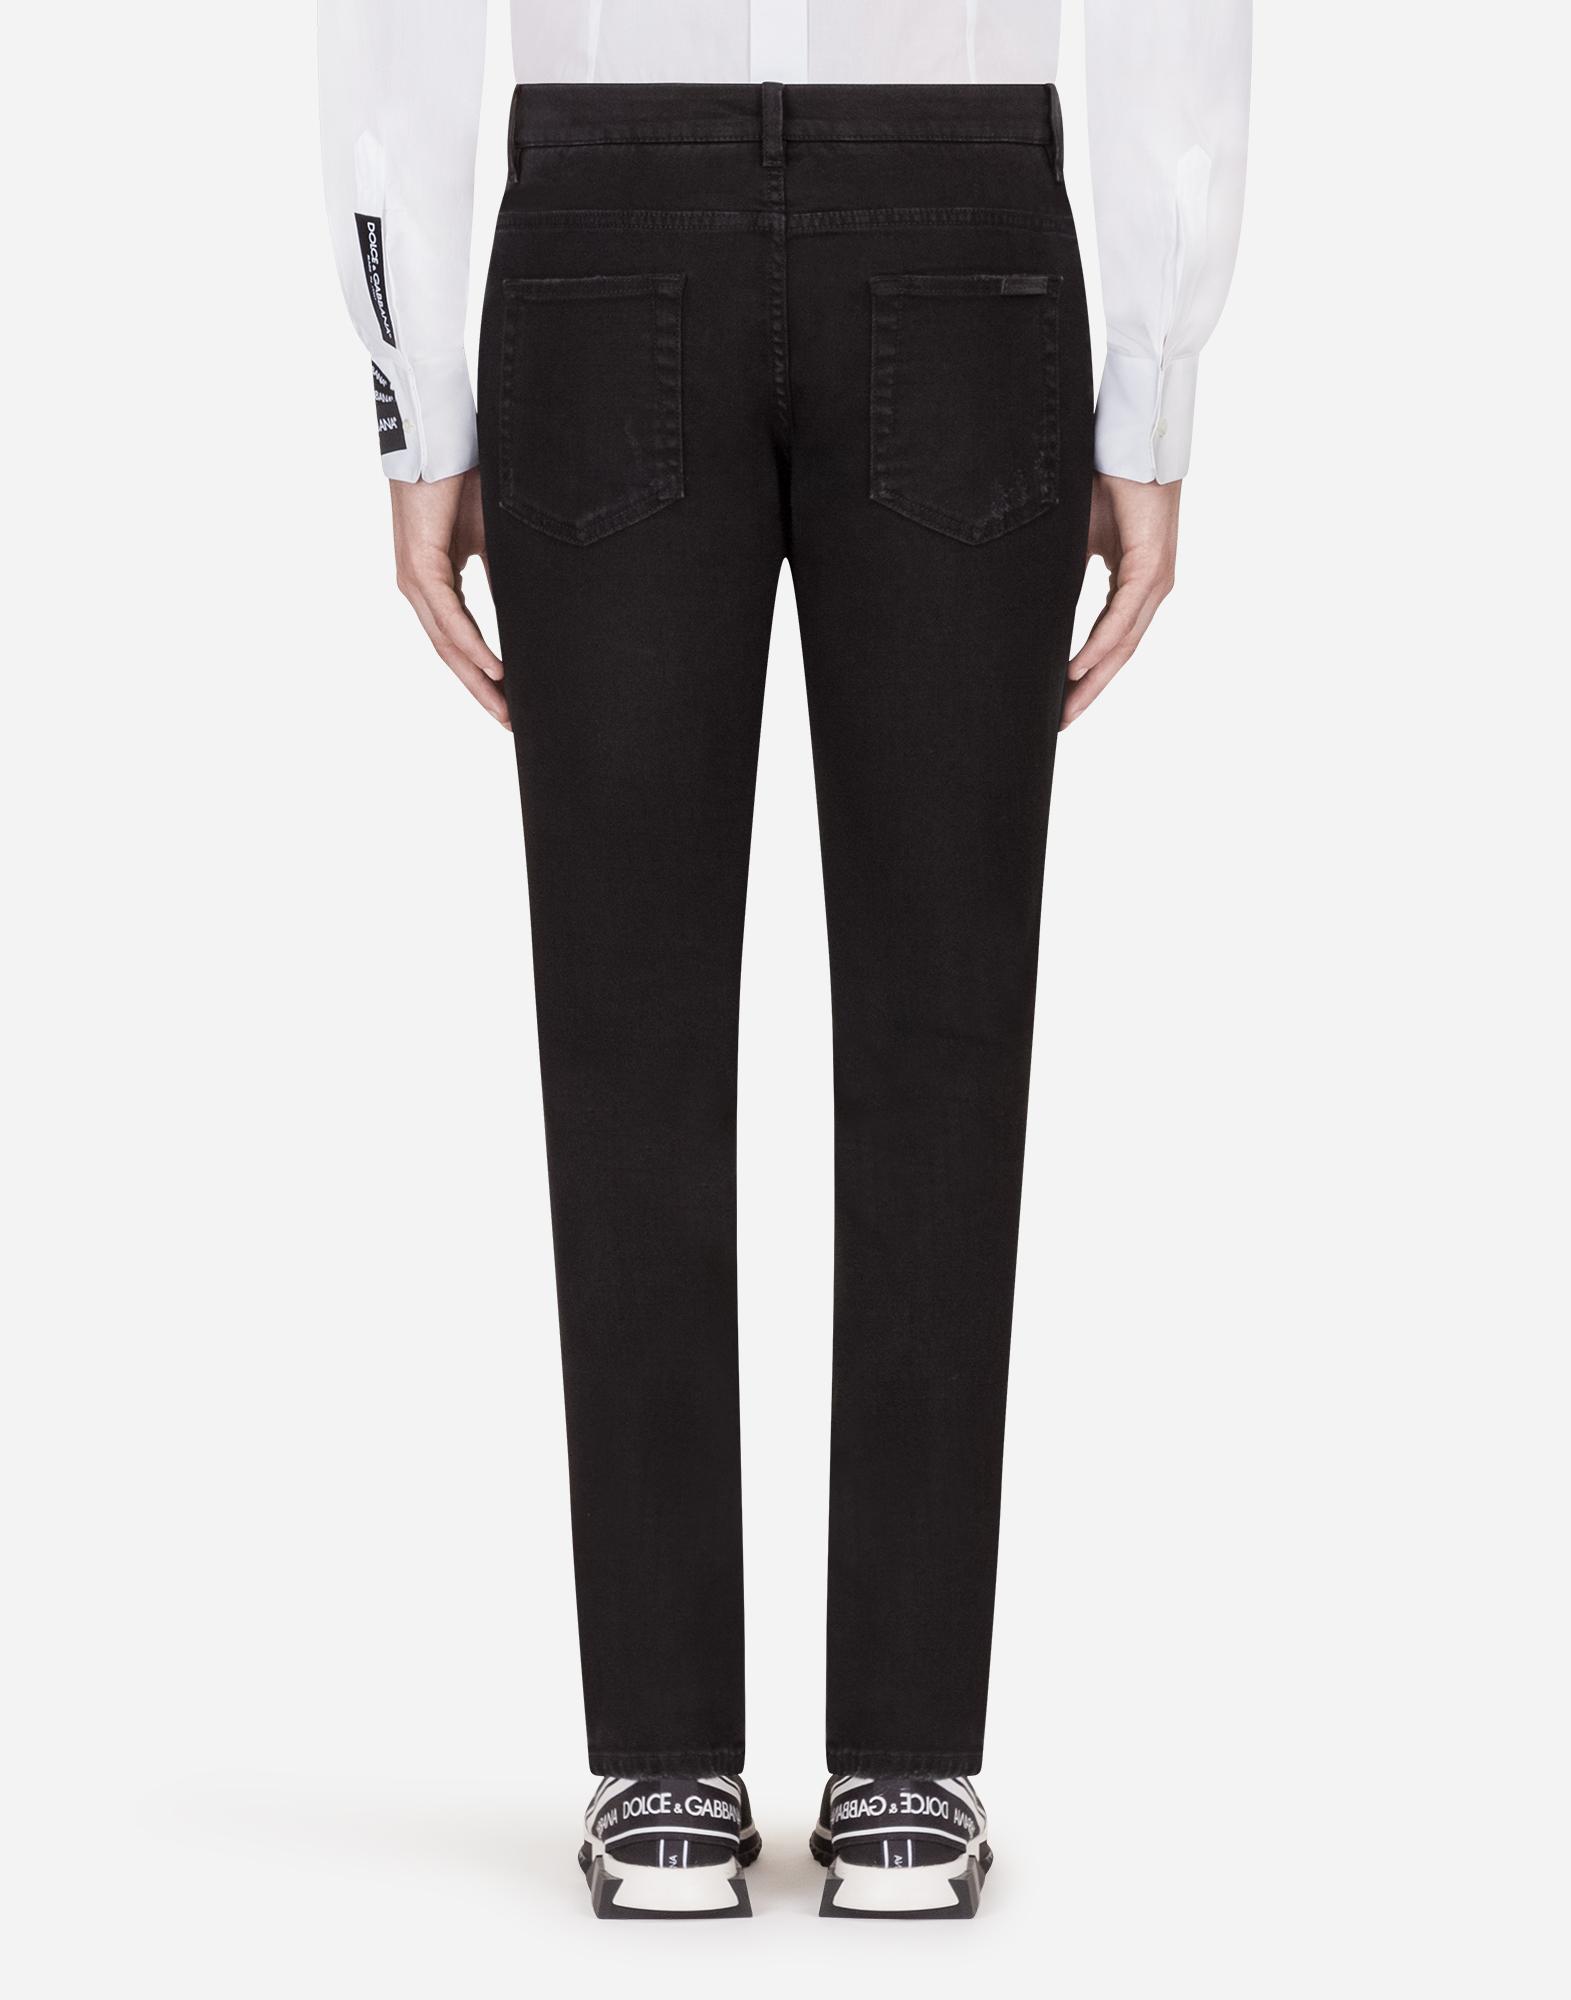 Dolce & Gabbana SKINNY FIT STRETCH JEANS